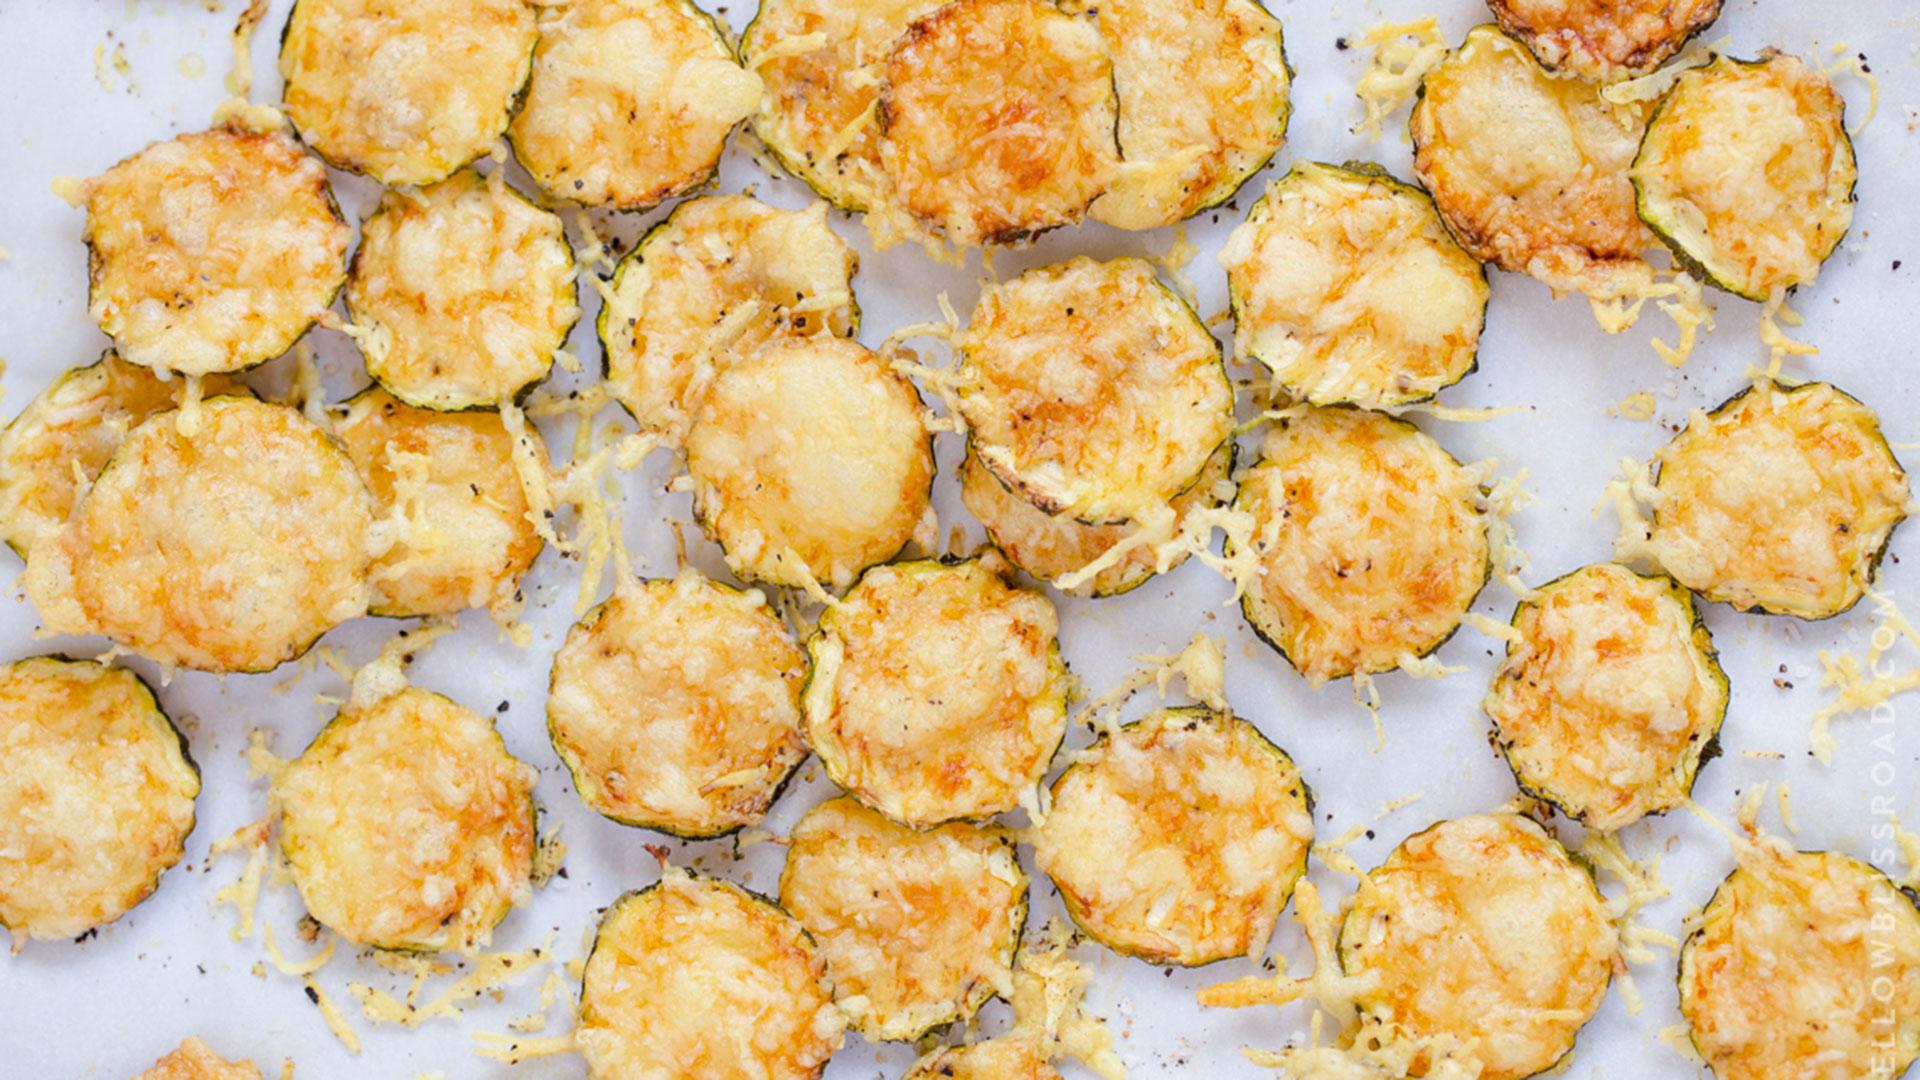 STYLECASTER | Healthy Homemade Snack Recipes